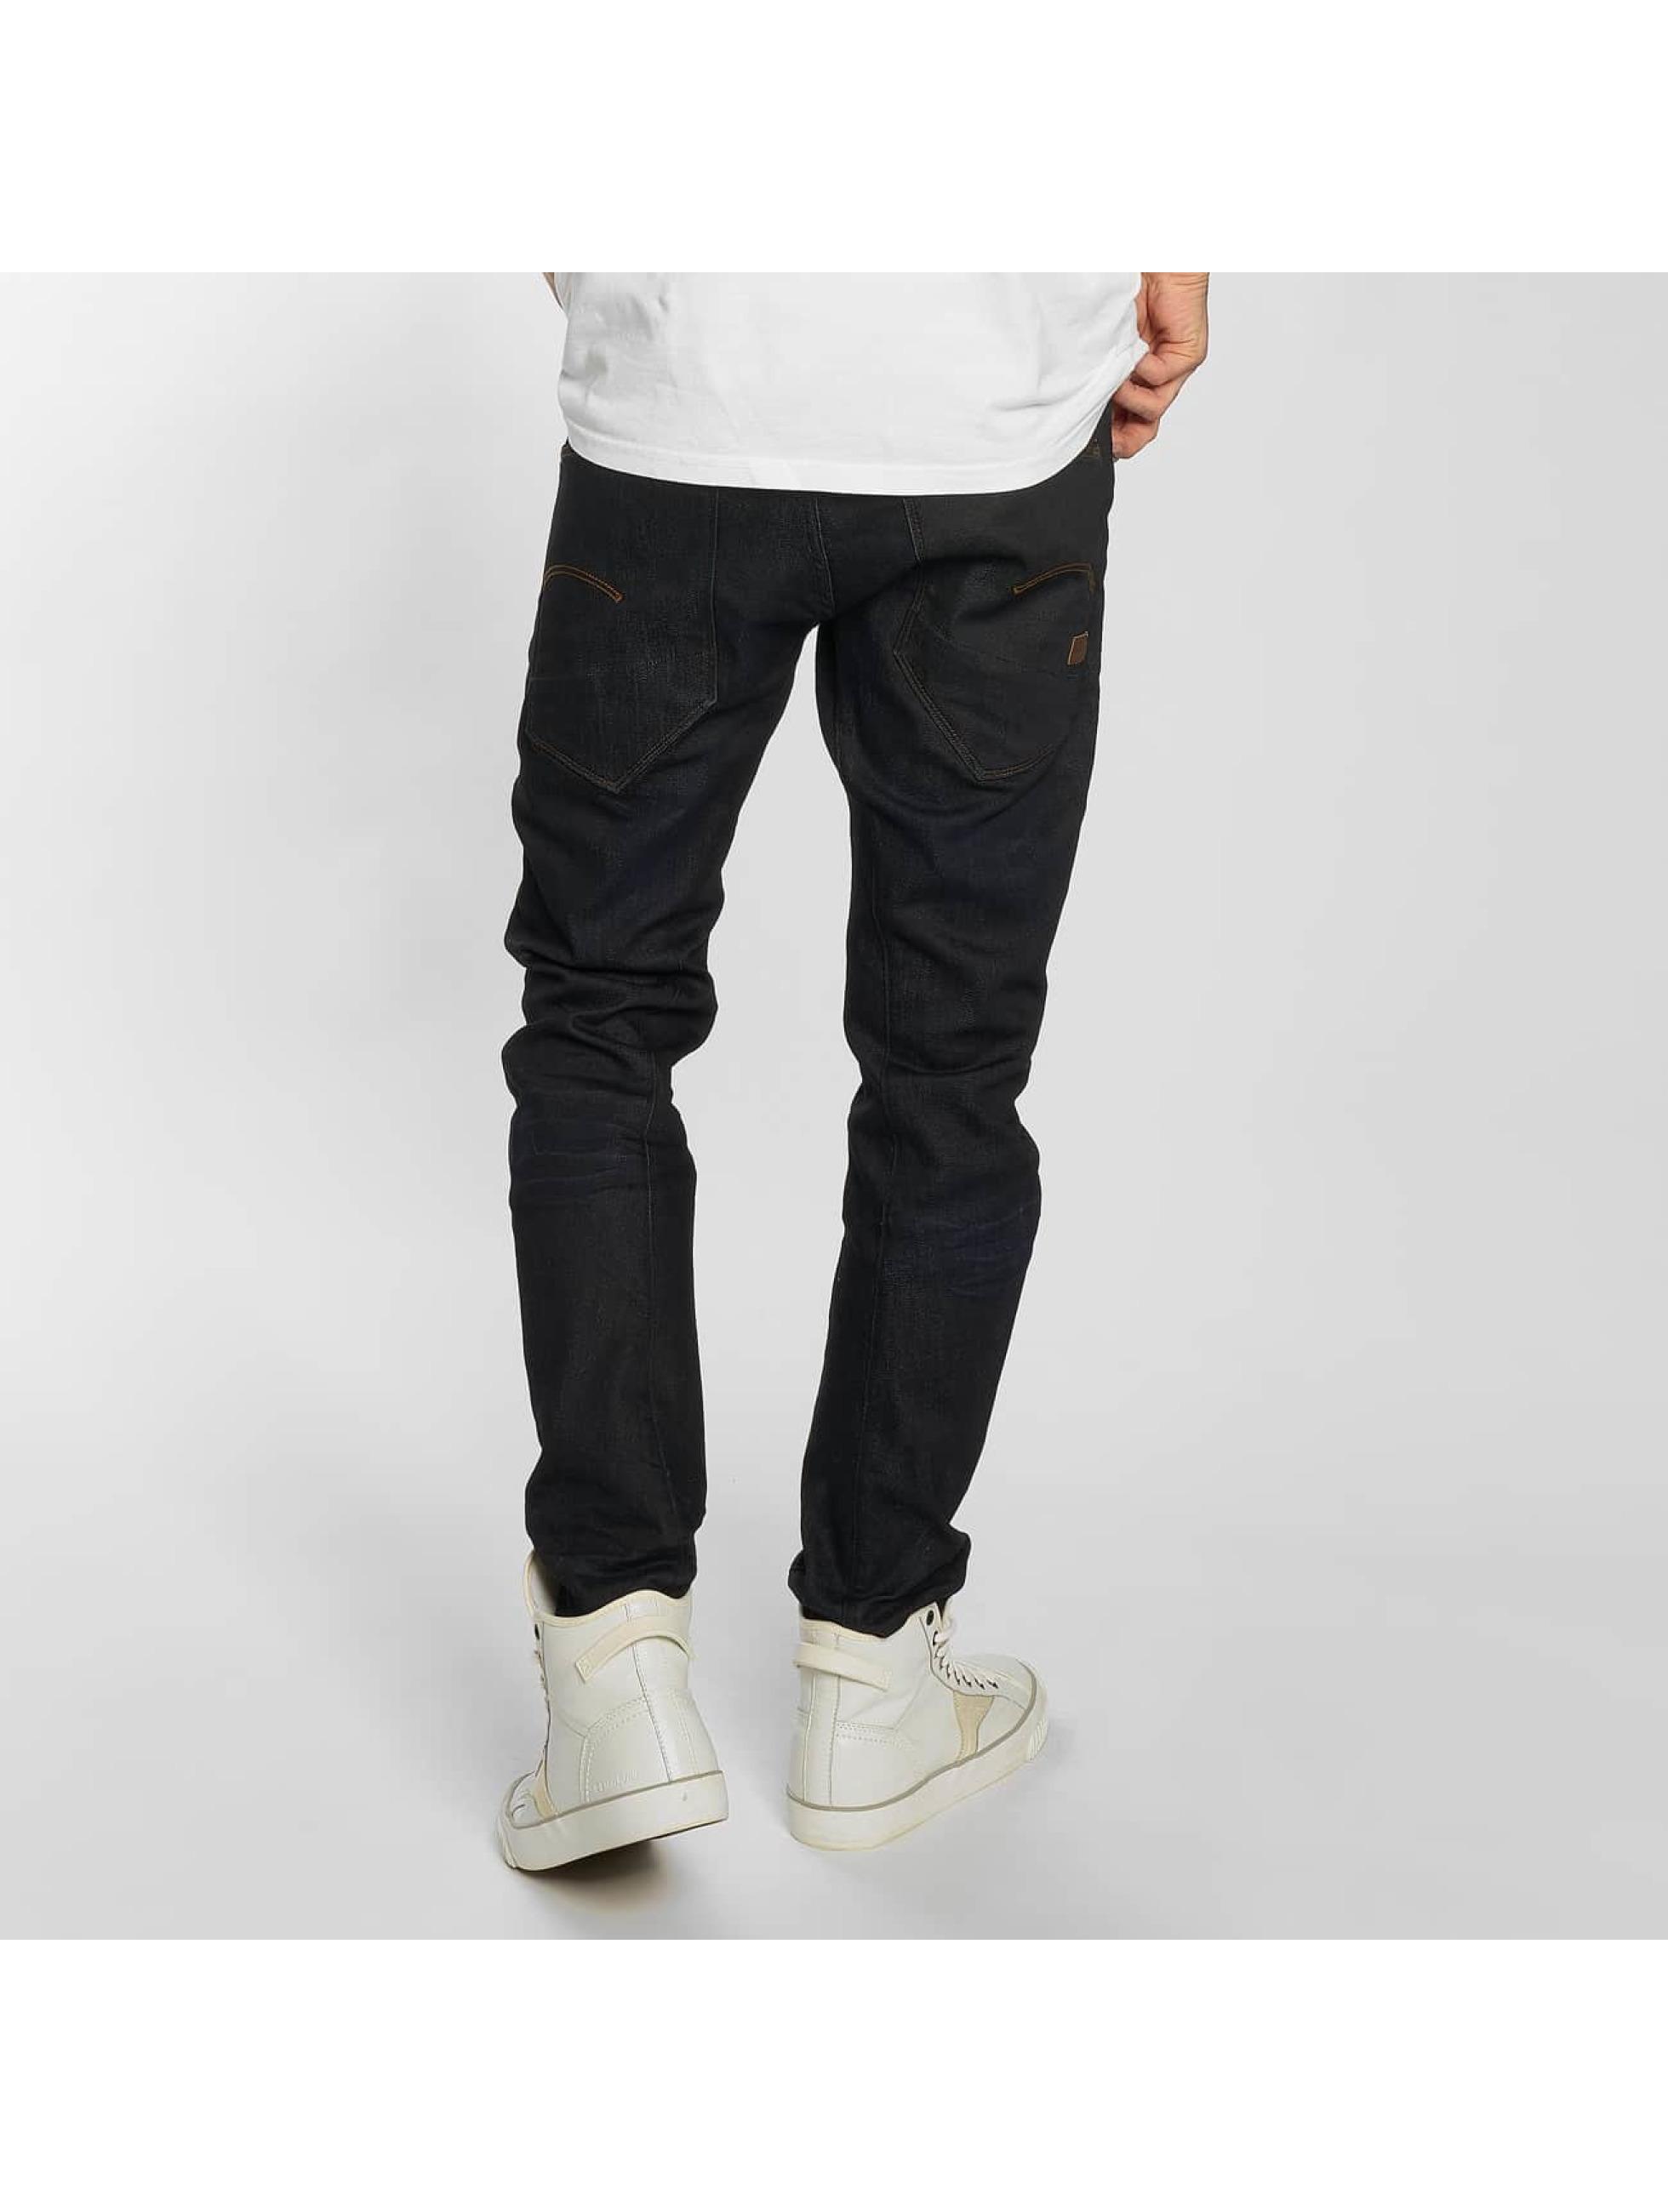 G-Star Skinny Jeans Type C Super Slim schwarz